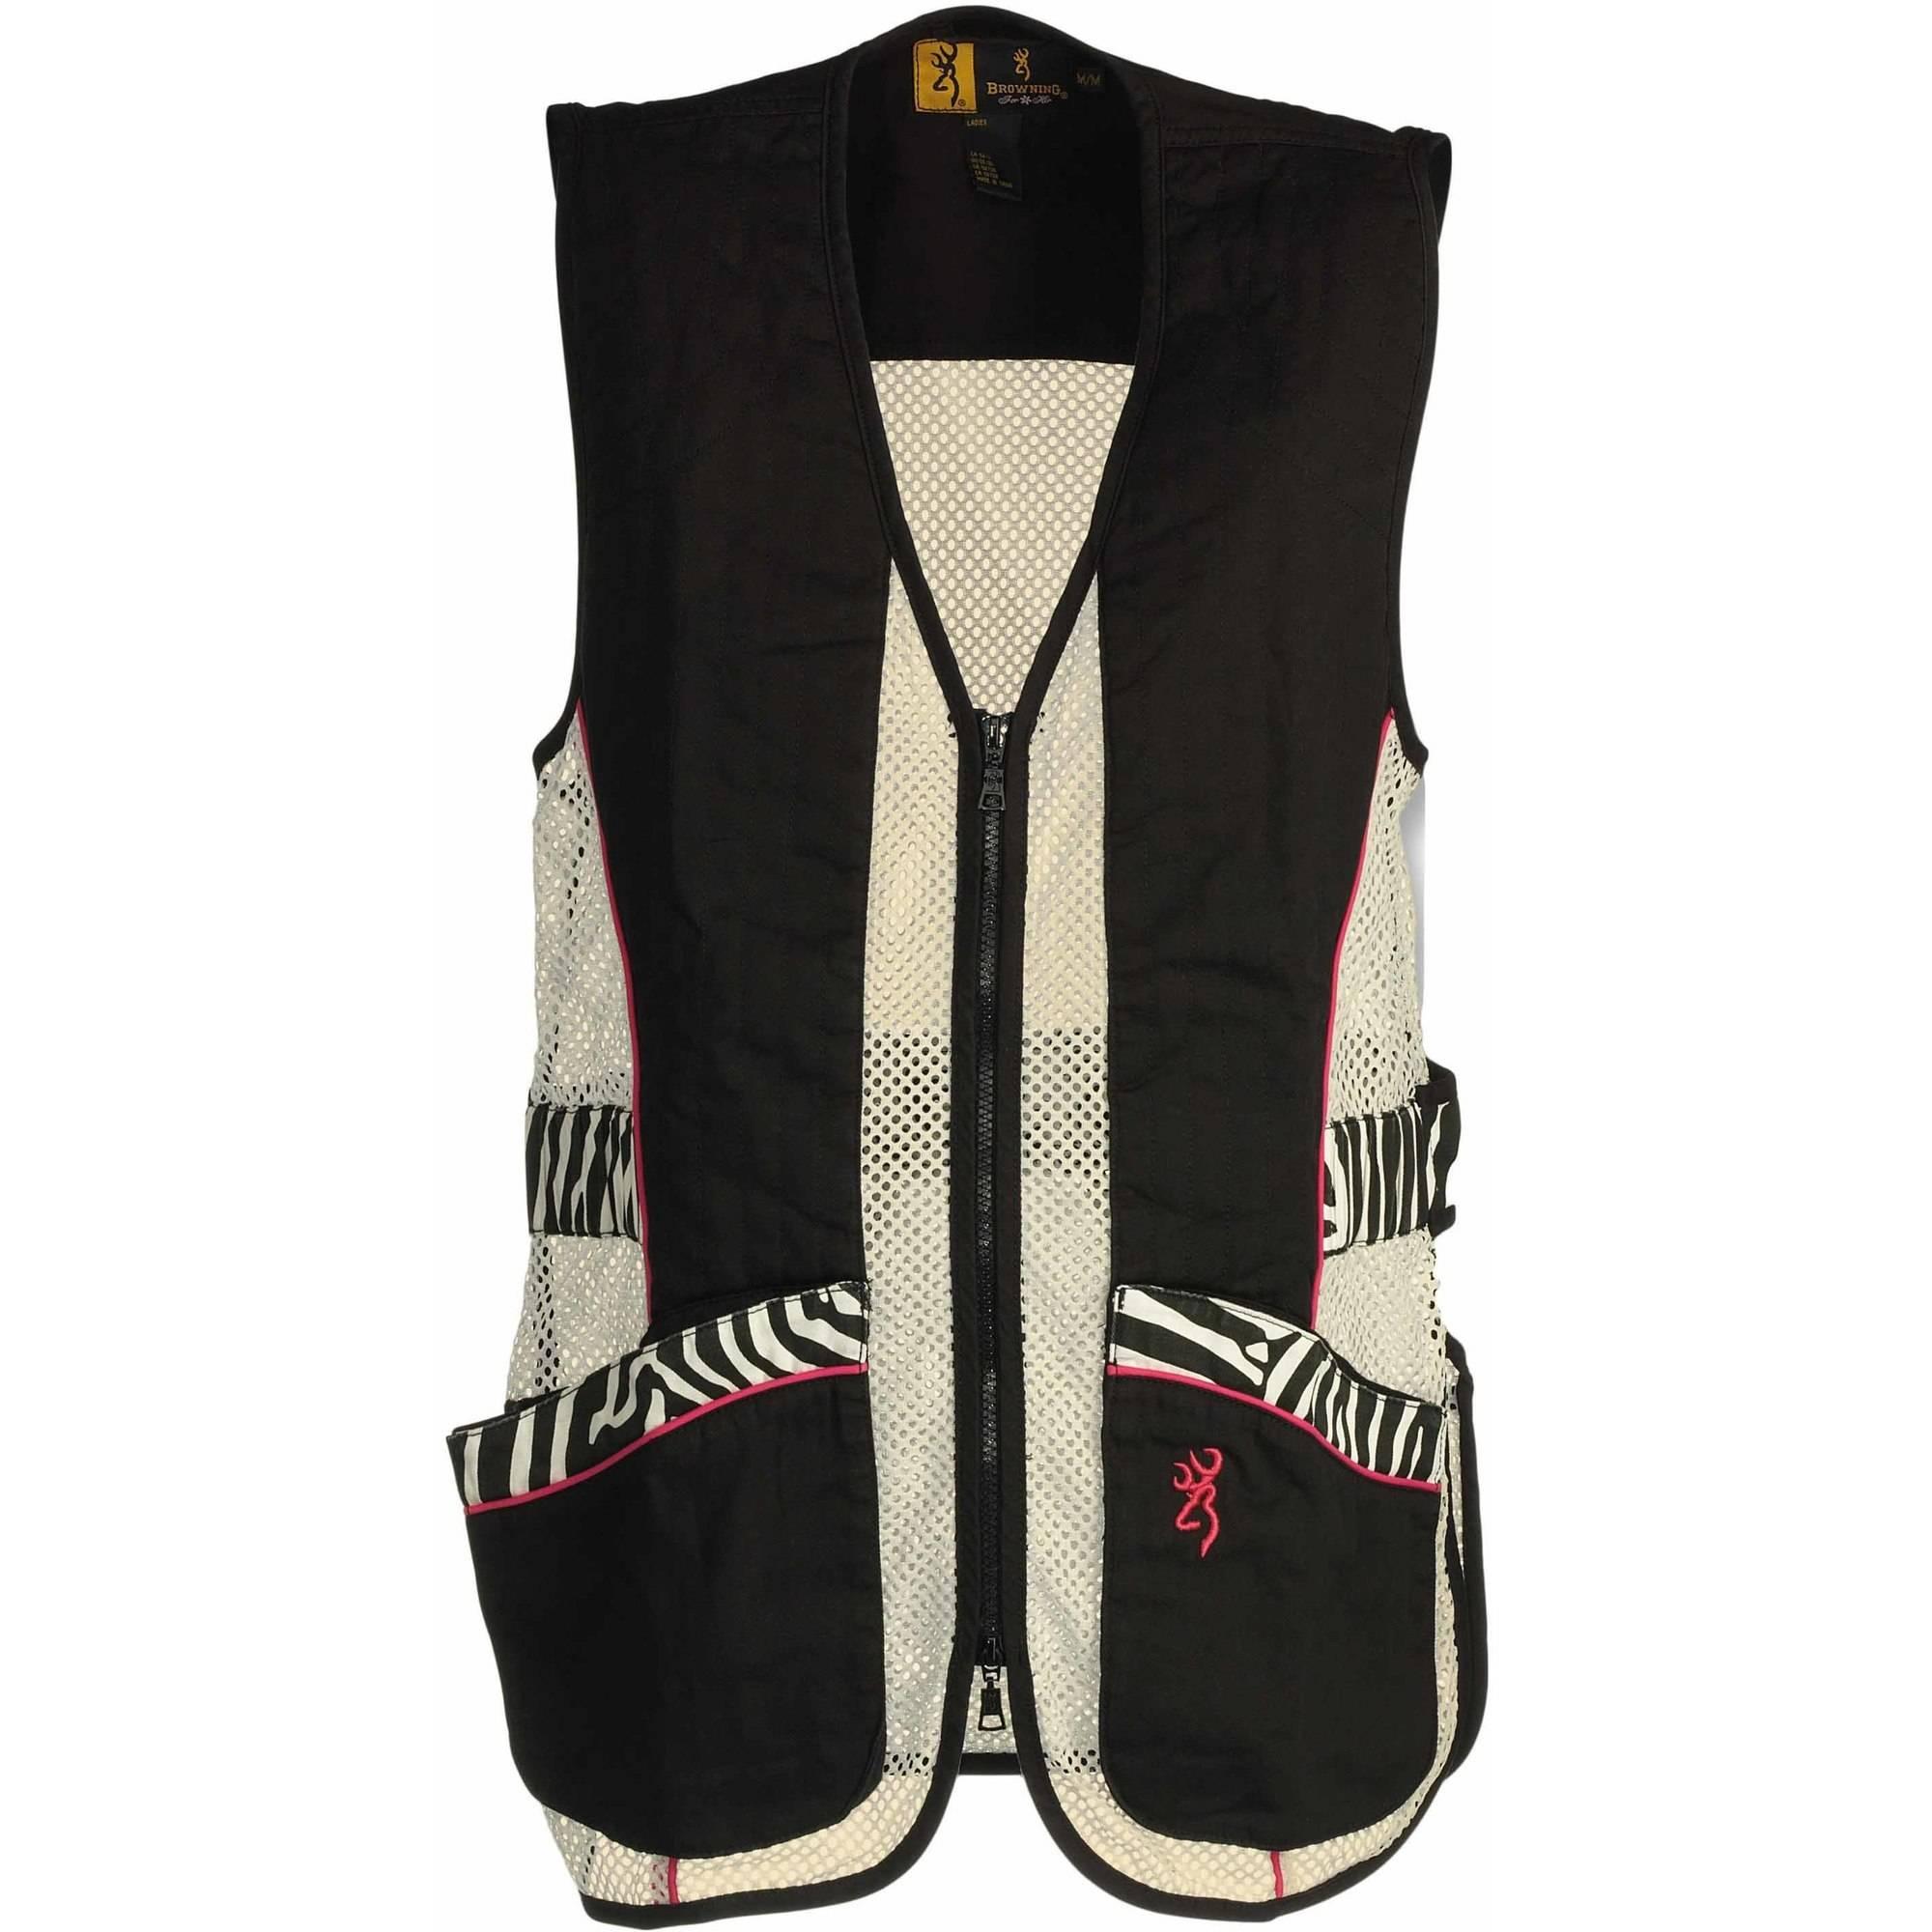 Browning Lady Sahara Black/Zebra Vest